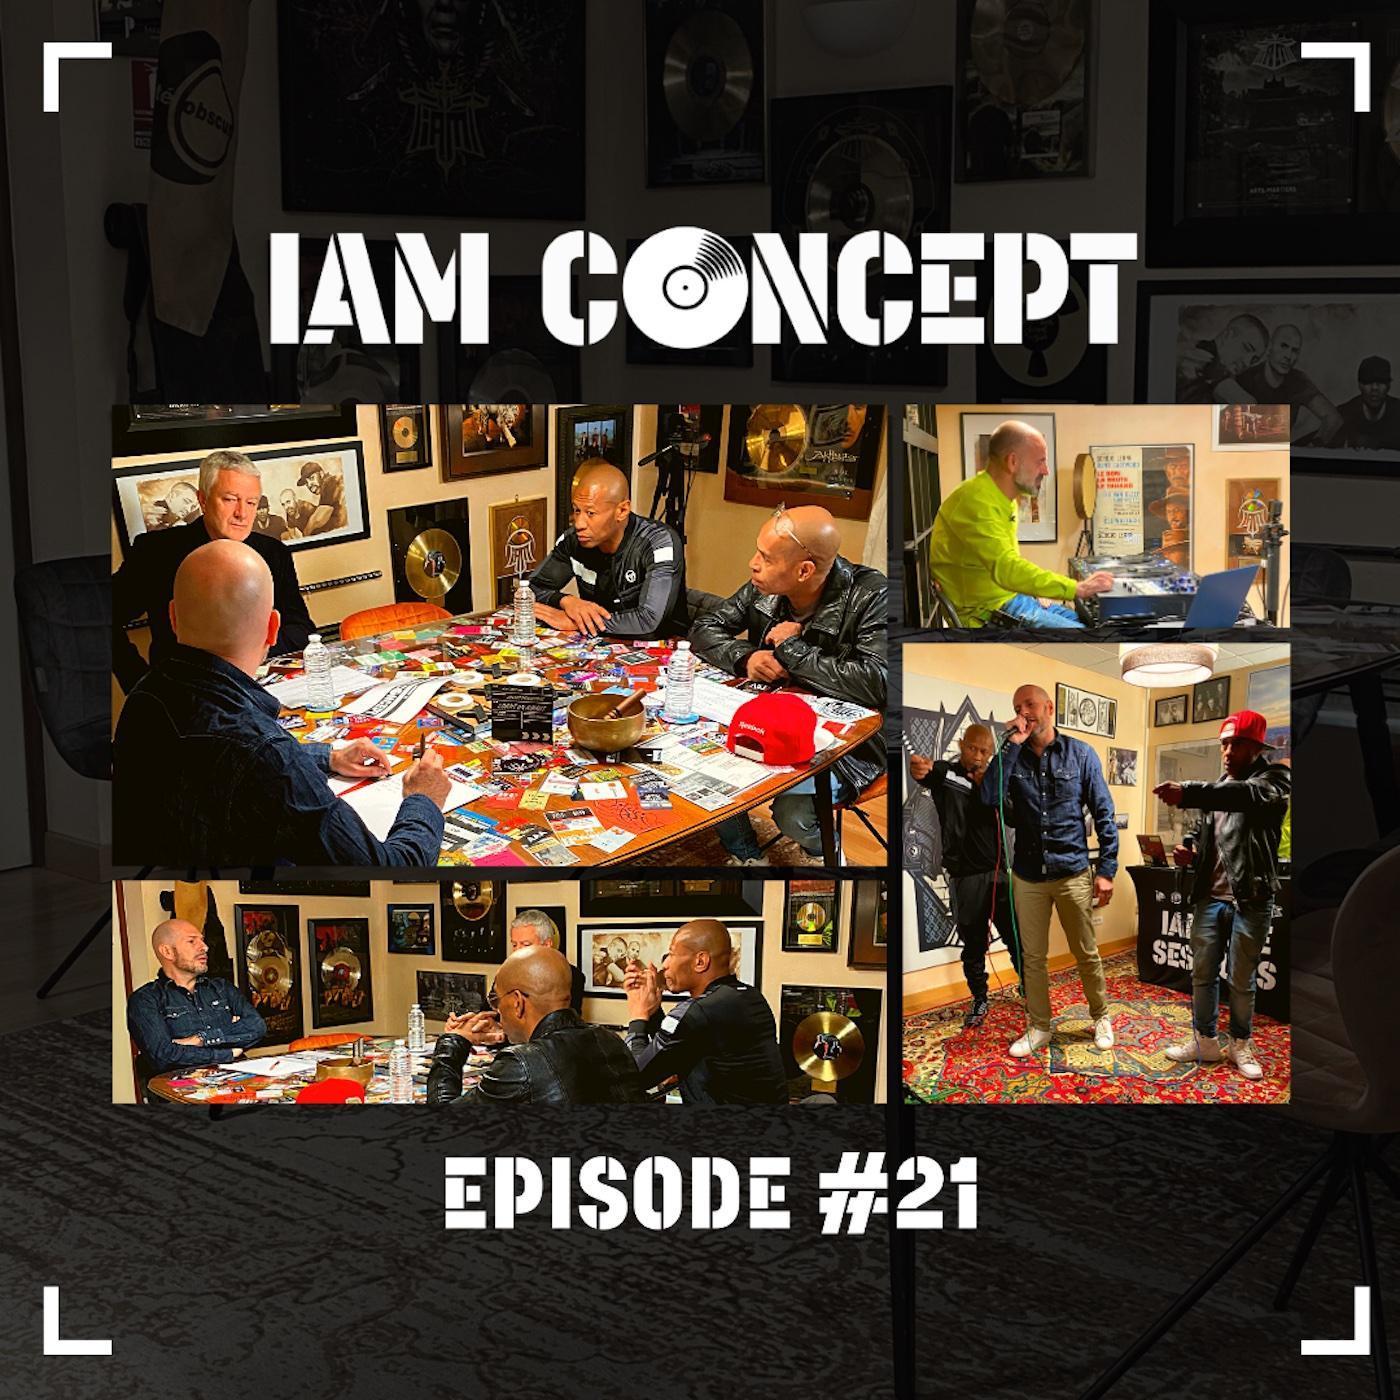 IAM CONCEPT #21 - WHOA!